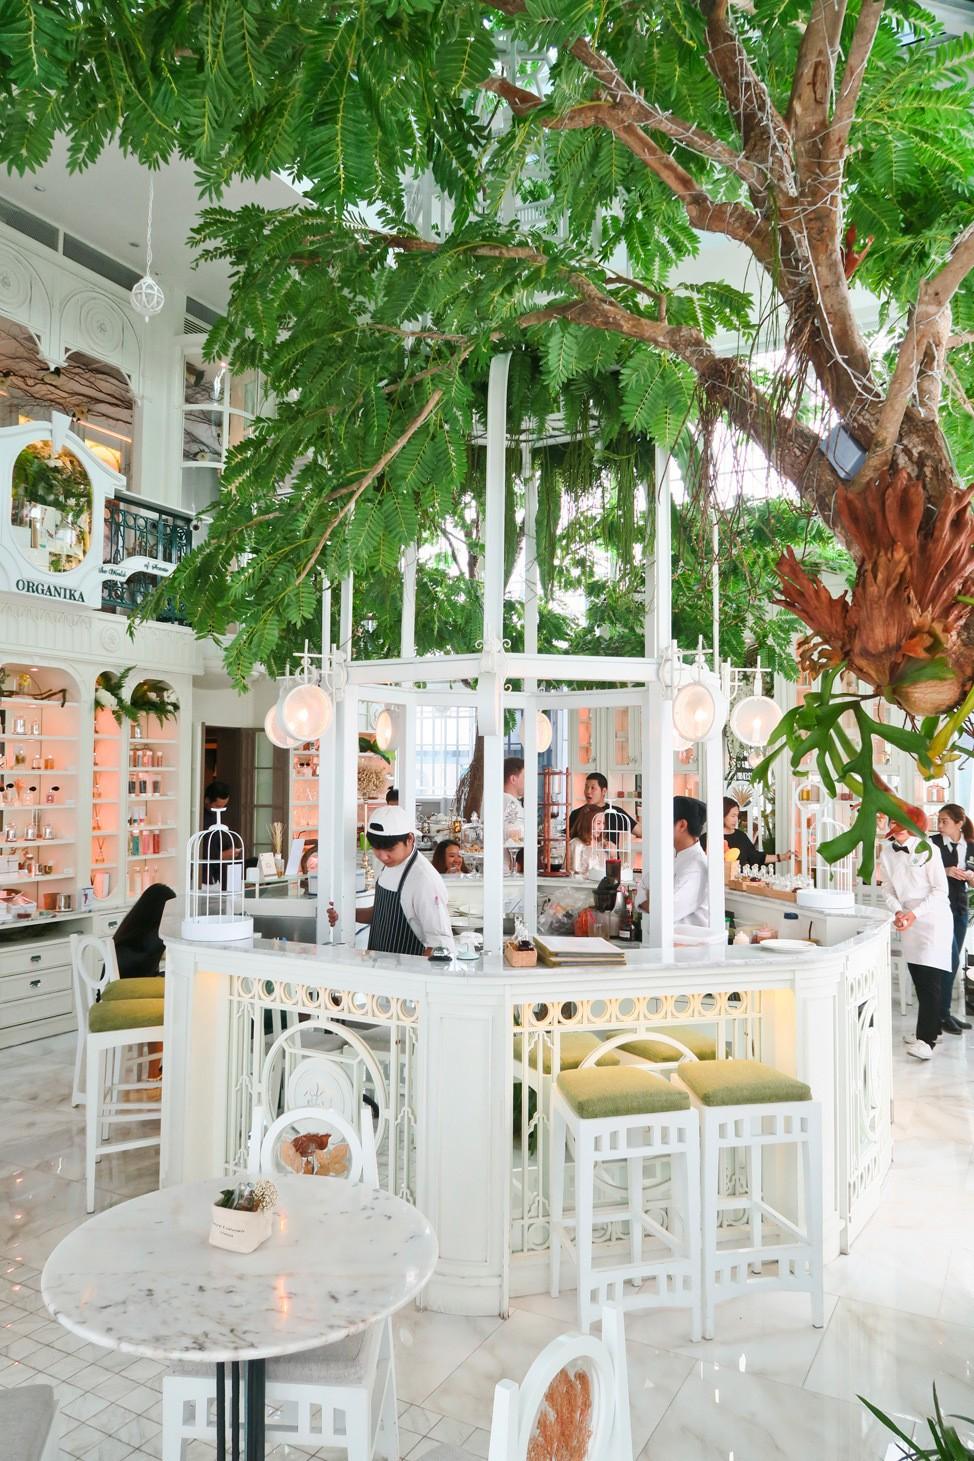 Organika Restaurant Bangkok